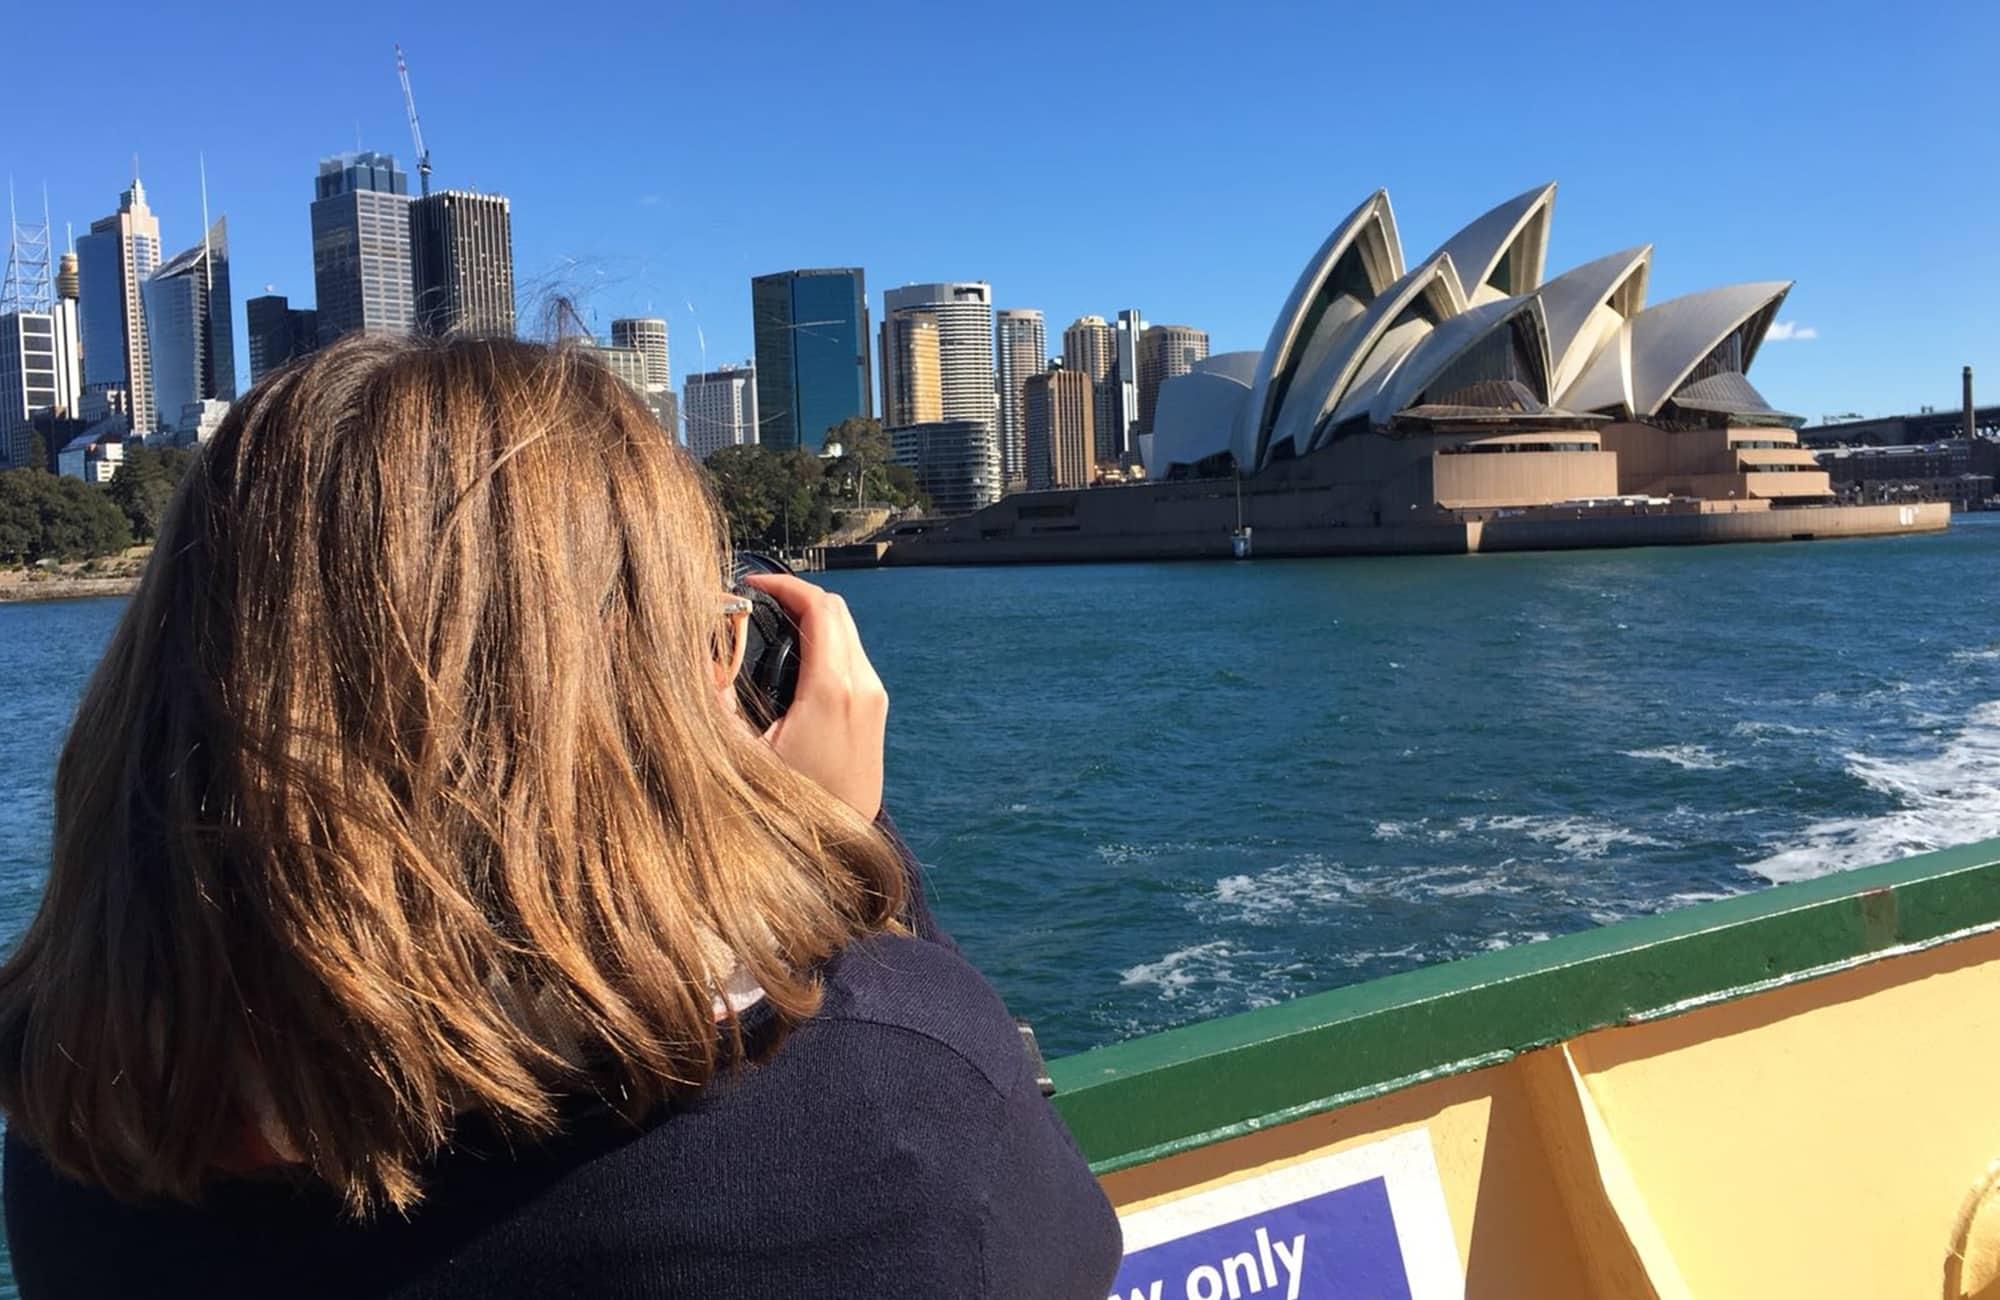 Opéra Sydney - Australie - Crédit Photo : Marianne